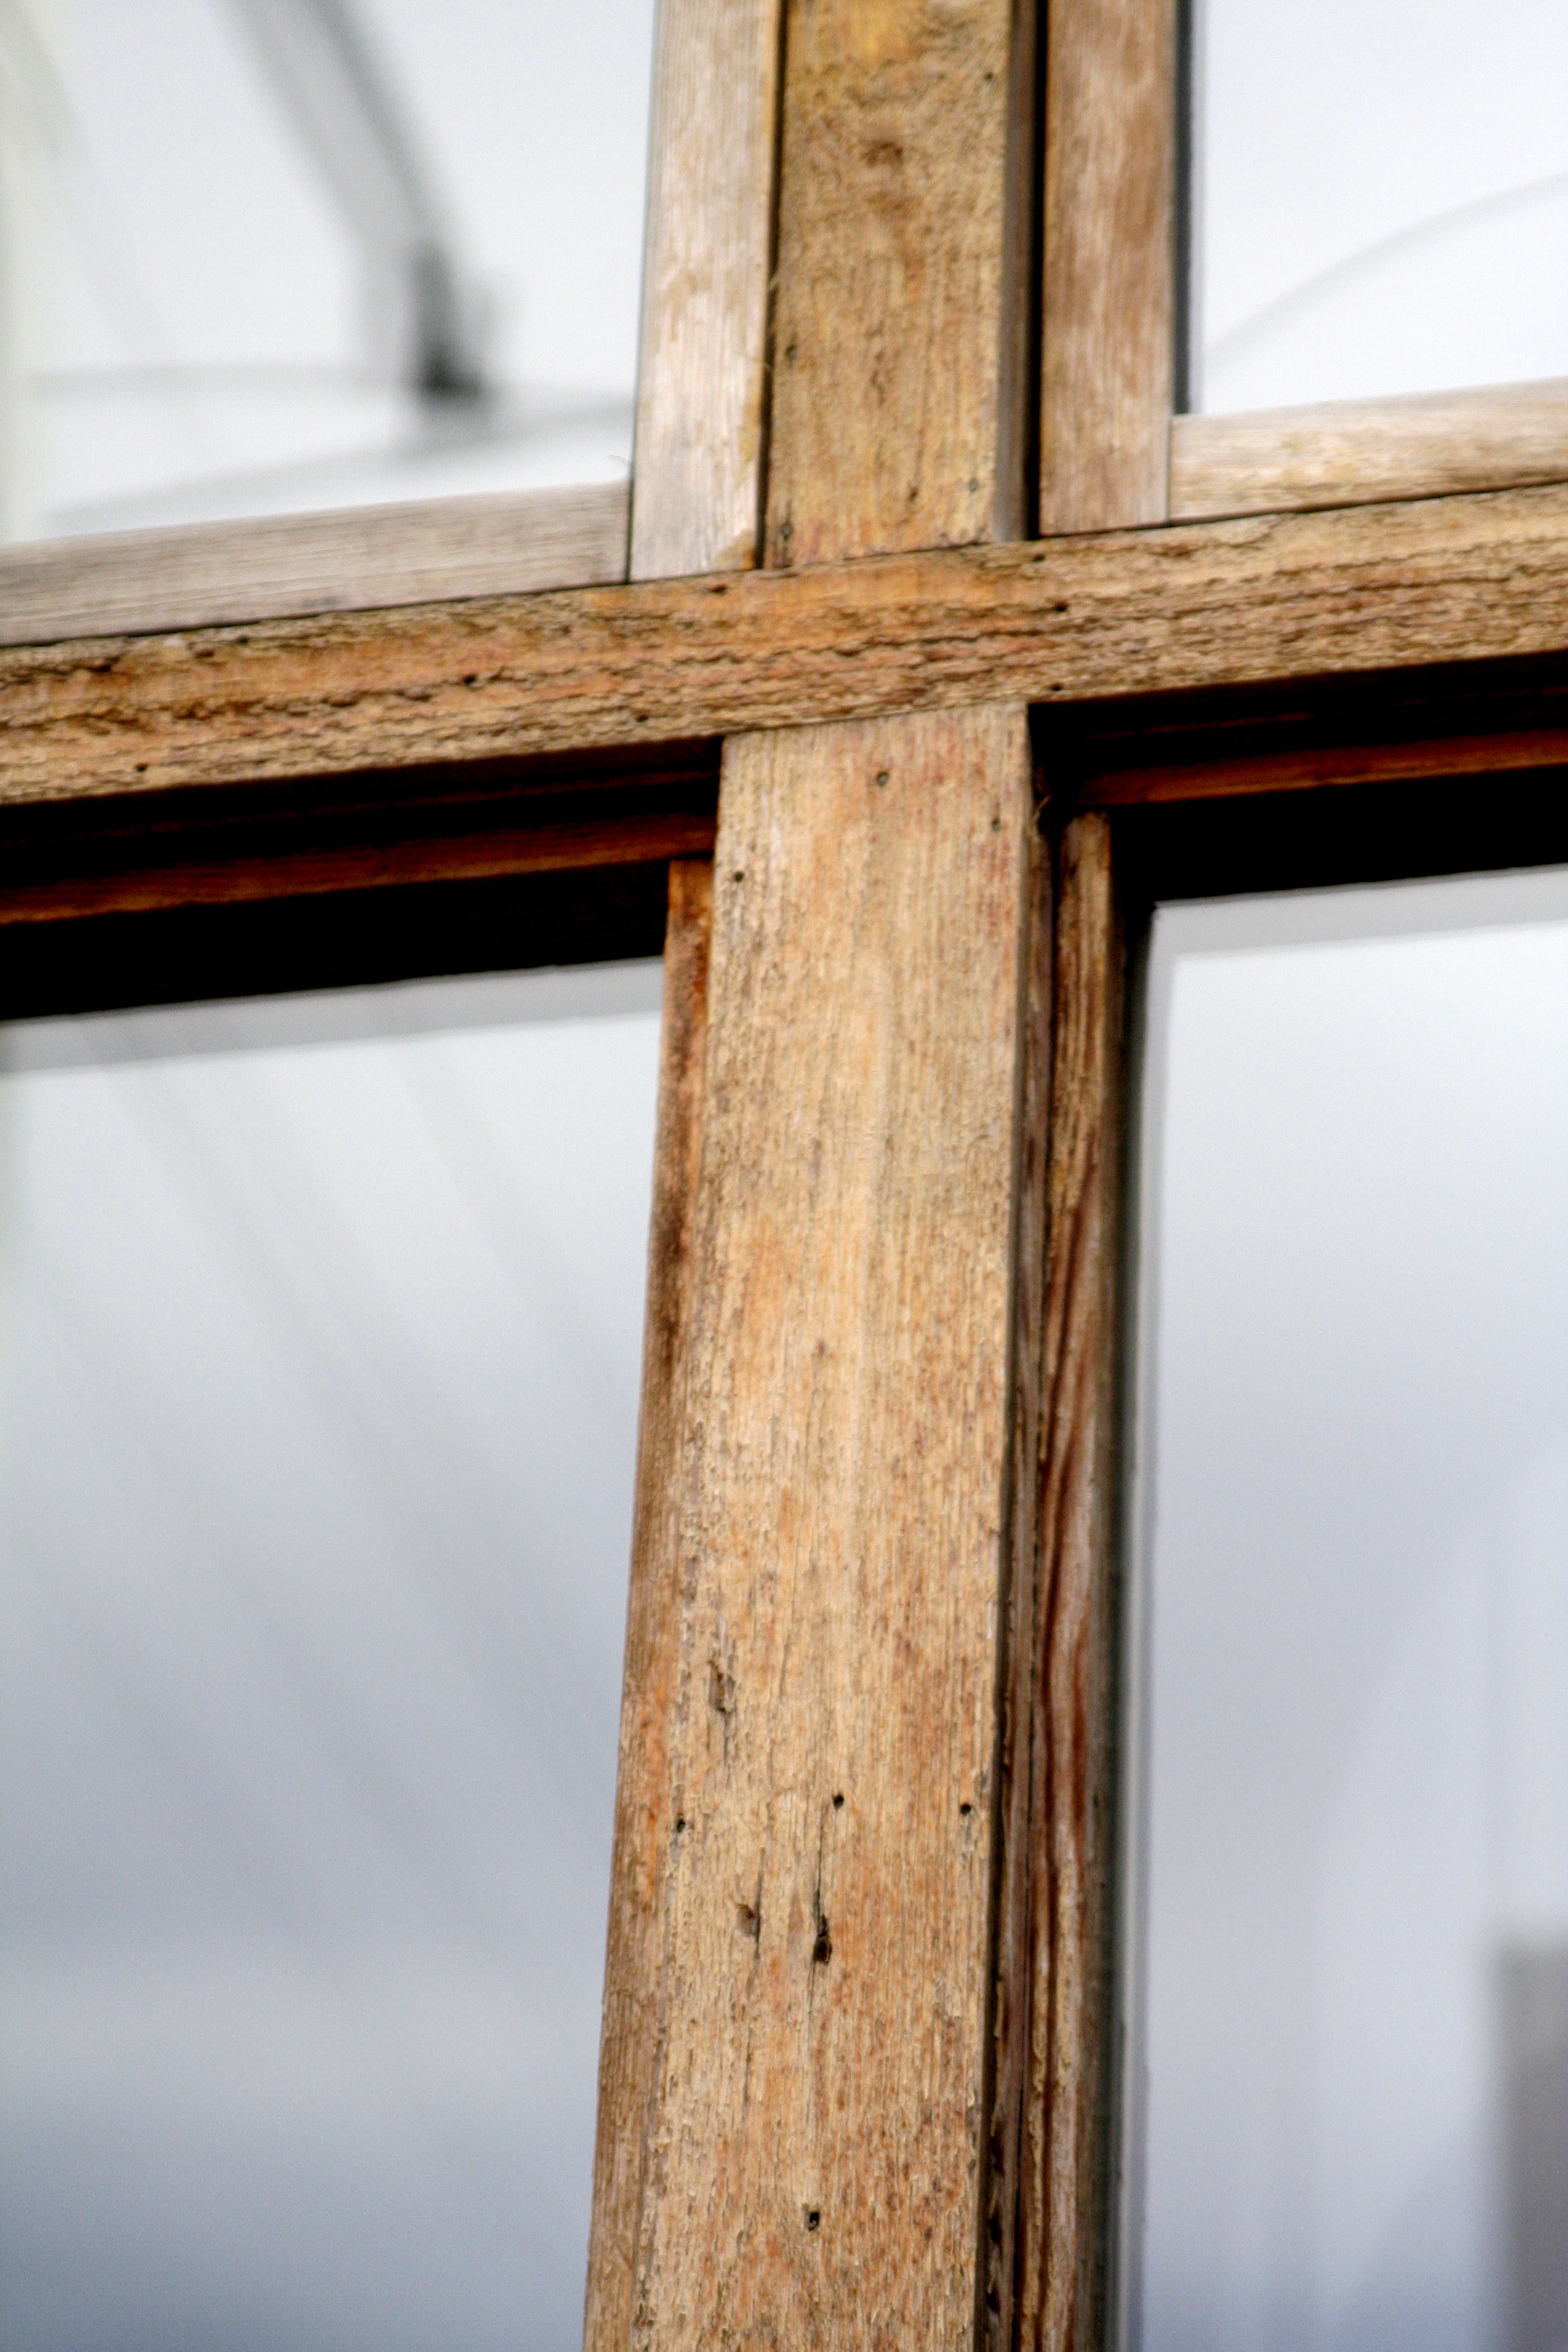 8464_Window_Pane_Cross